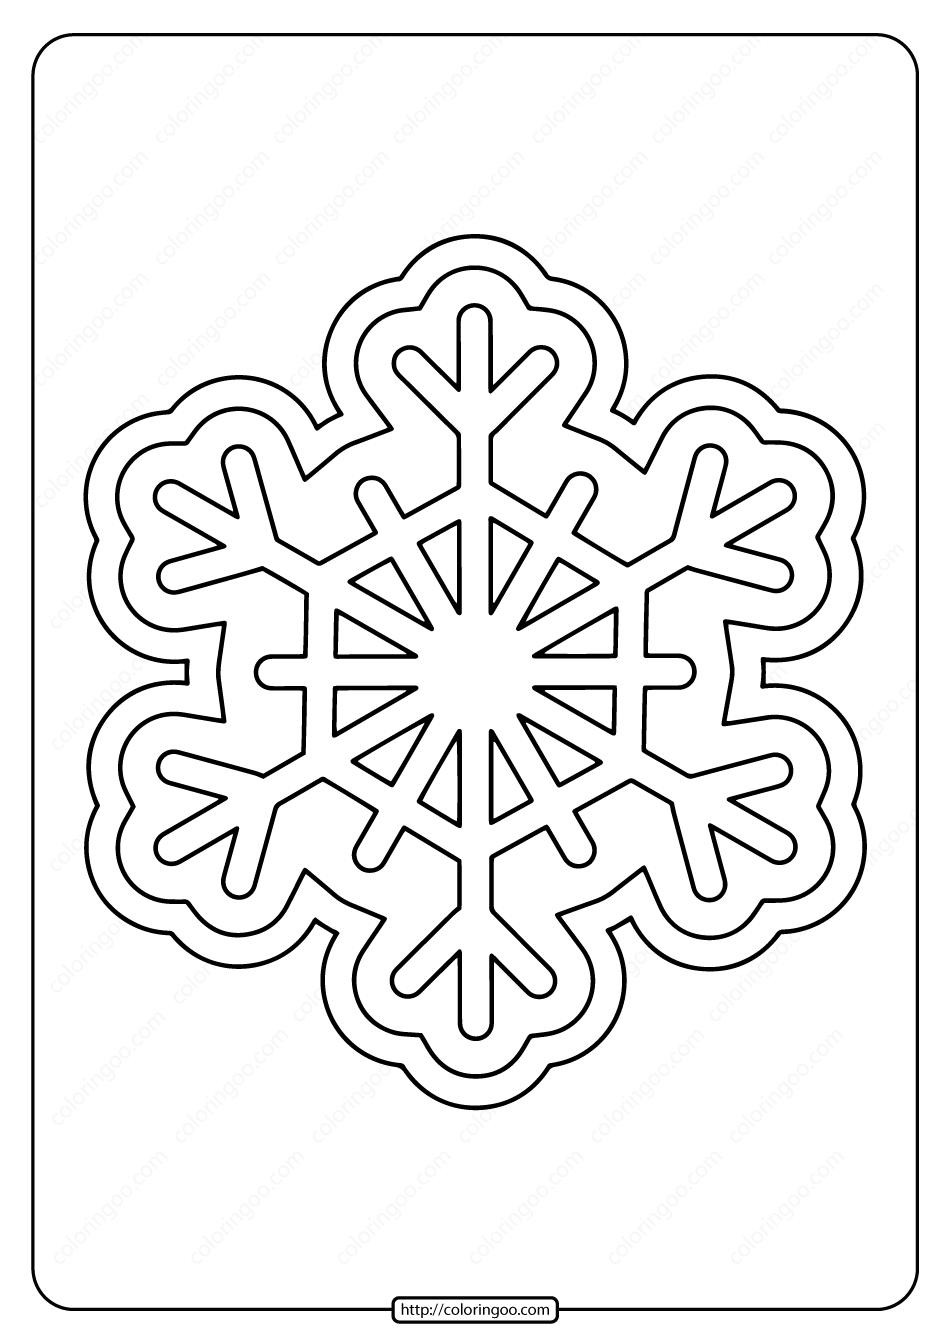 Free Printable Snowflake Pdf Coloring Pages